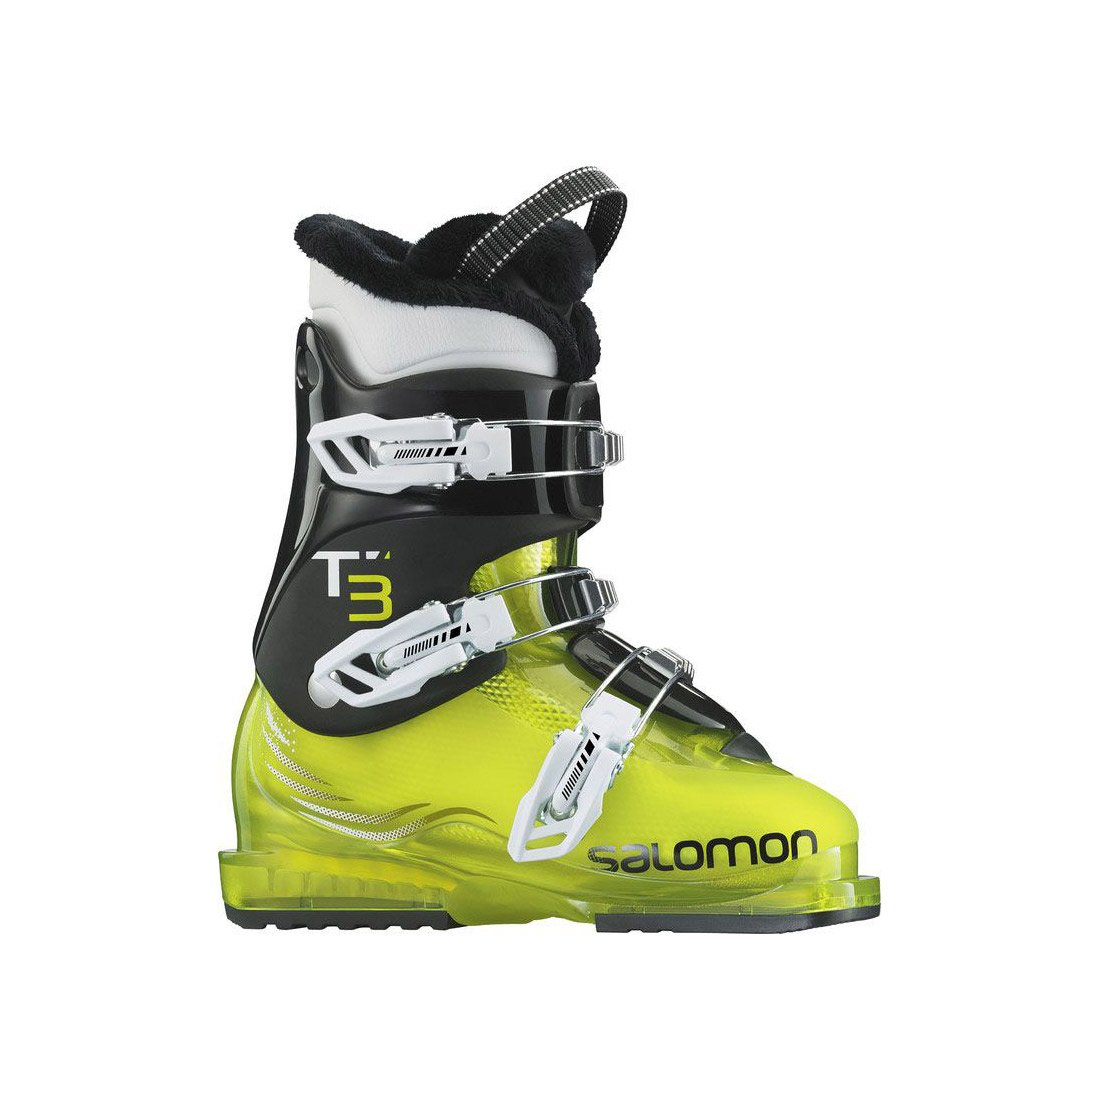 Salomon T3 RT Ski Boot Youth Acid Green/Black 23.5 by Salomon